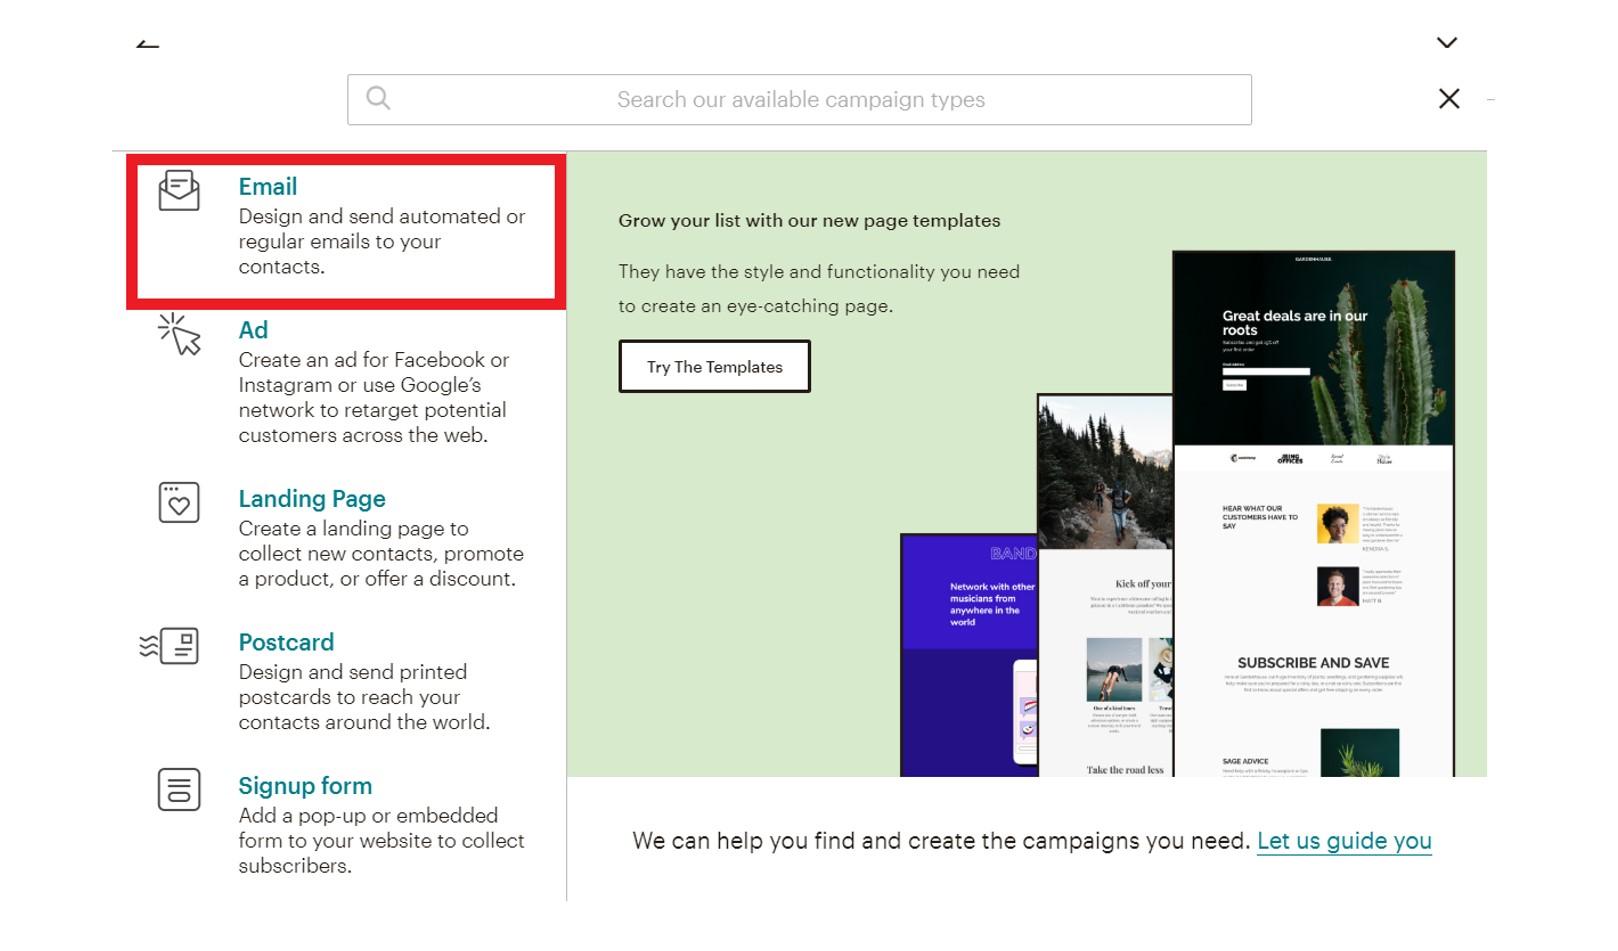 Mailchimp welcome email setup